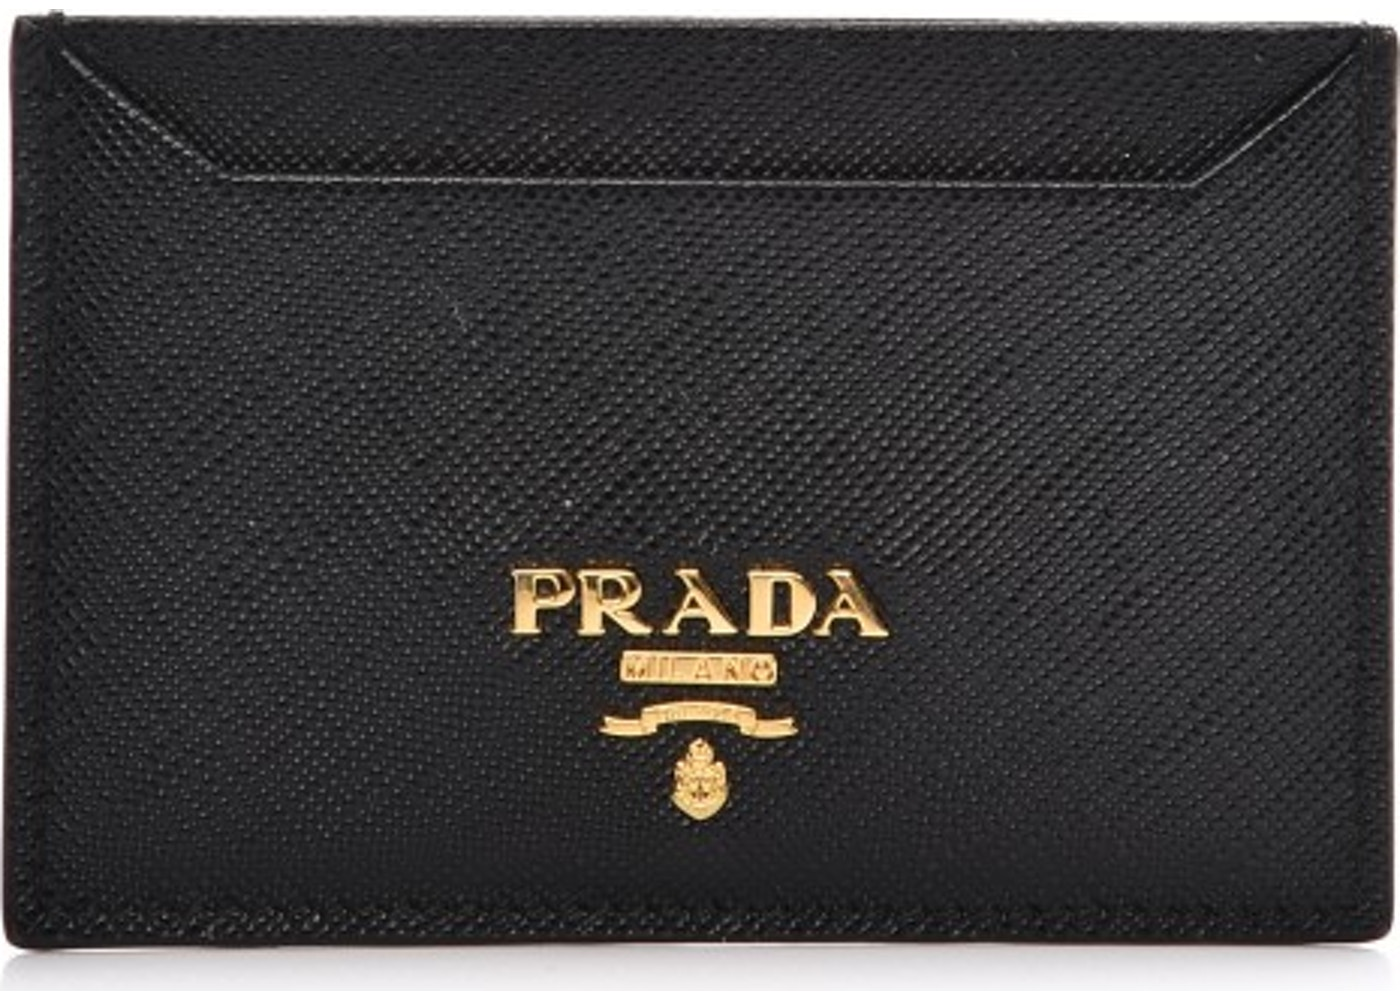 cff8037b8f0a Prada Metal Card Case Wallet Saffiano Nero Black. Saffiano Nero Black